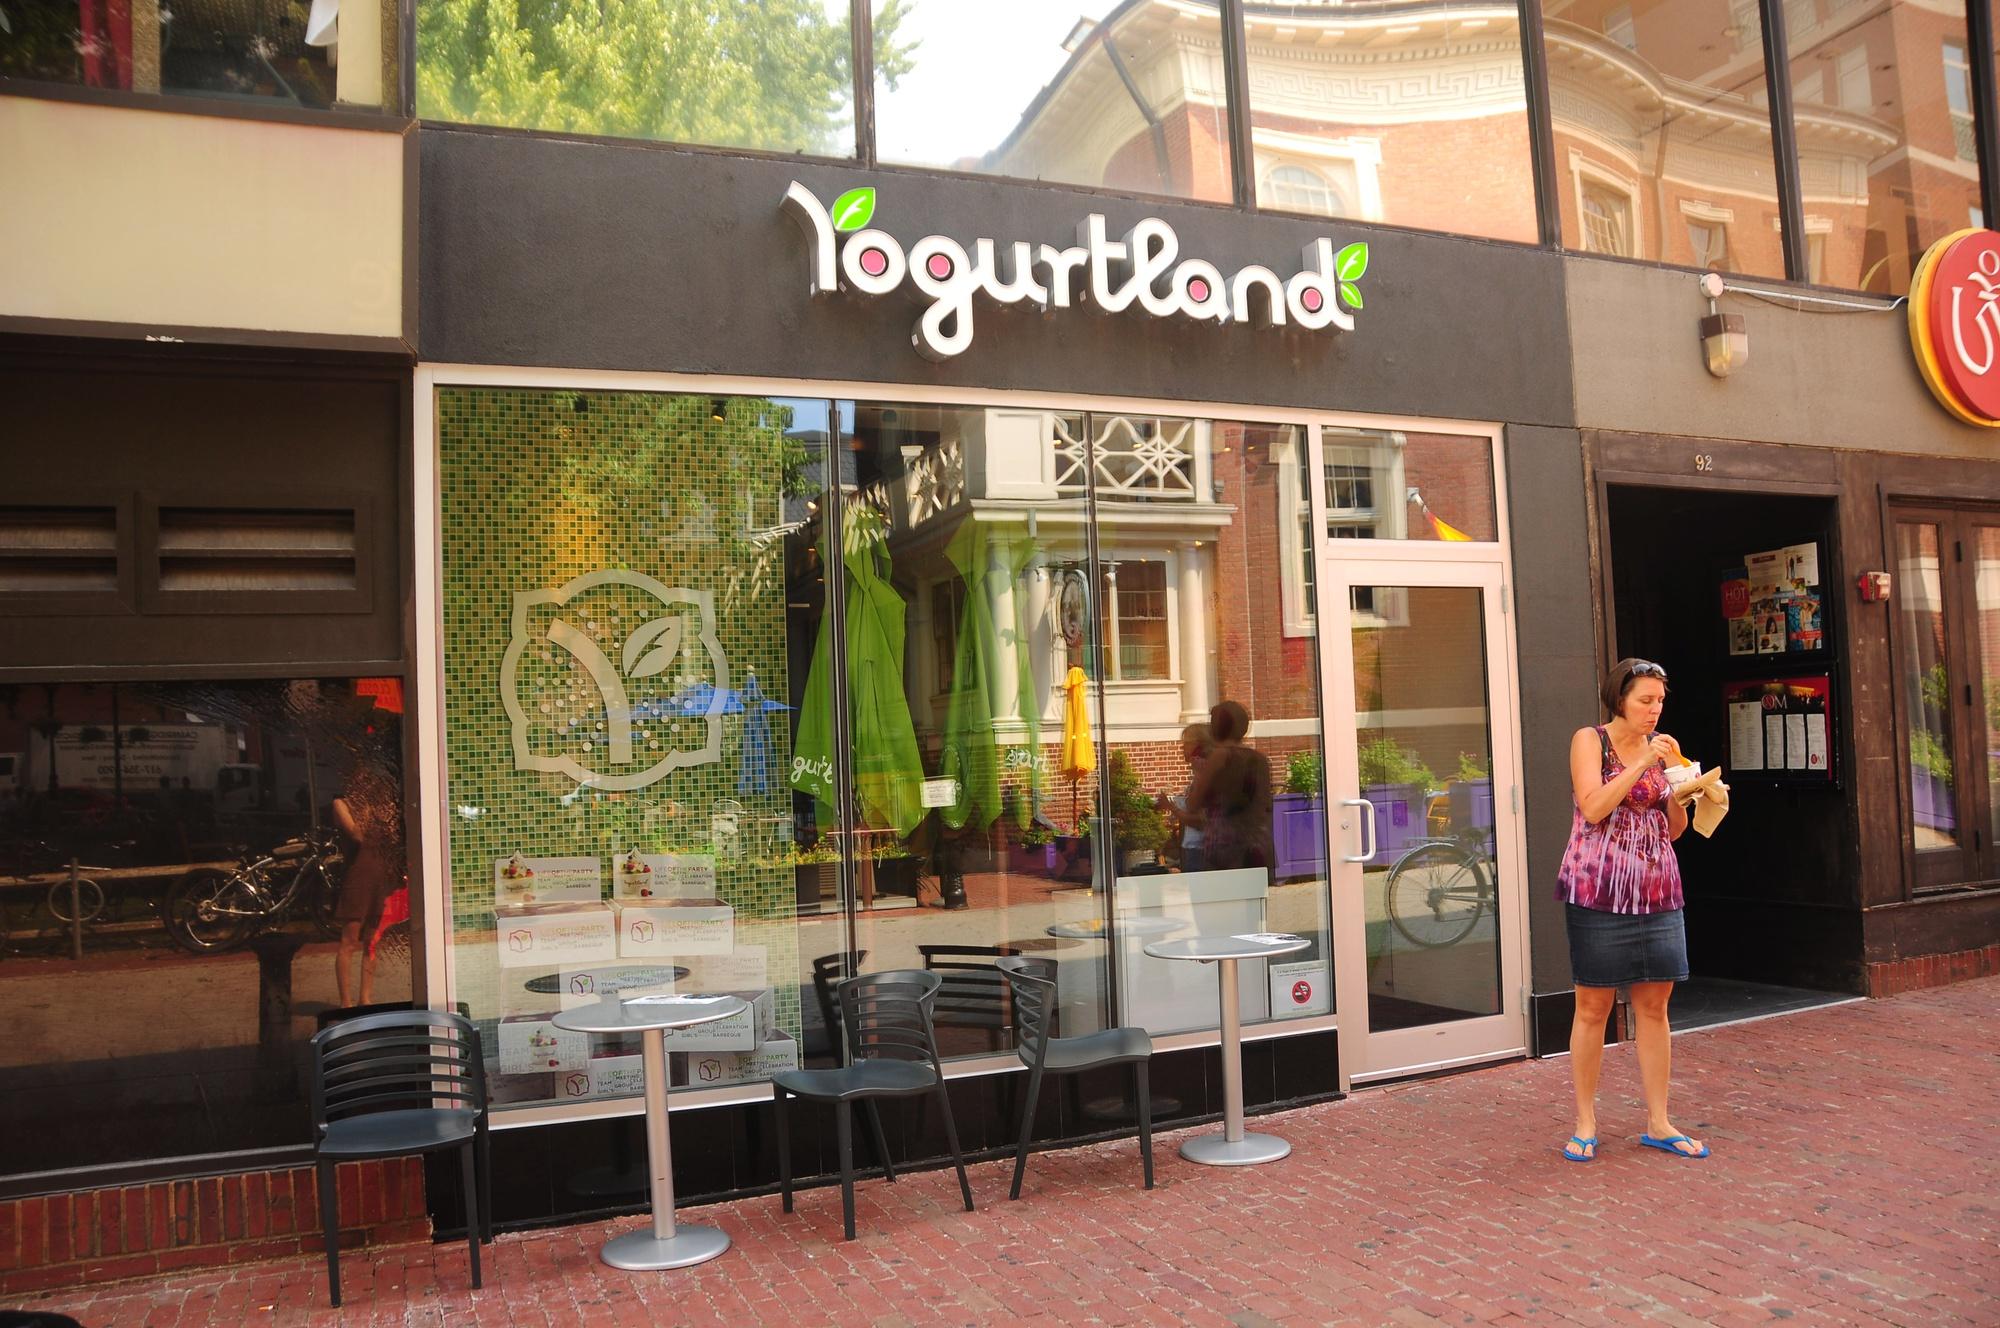 Yogurtland patron Debbie Marujo exits the new frozen yogurt joint, chocolate and pistachio froyo in hand.